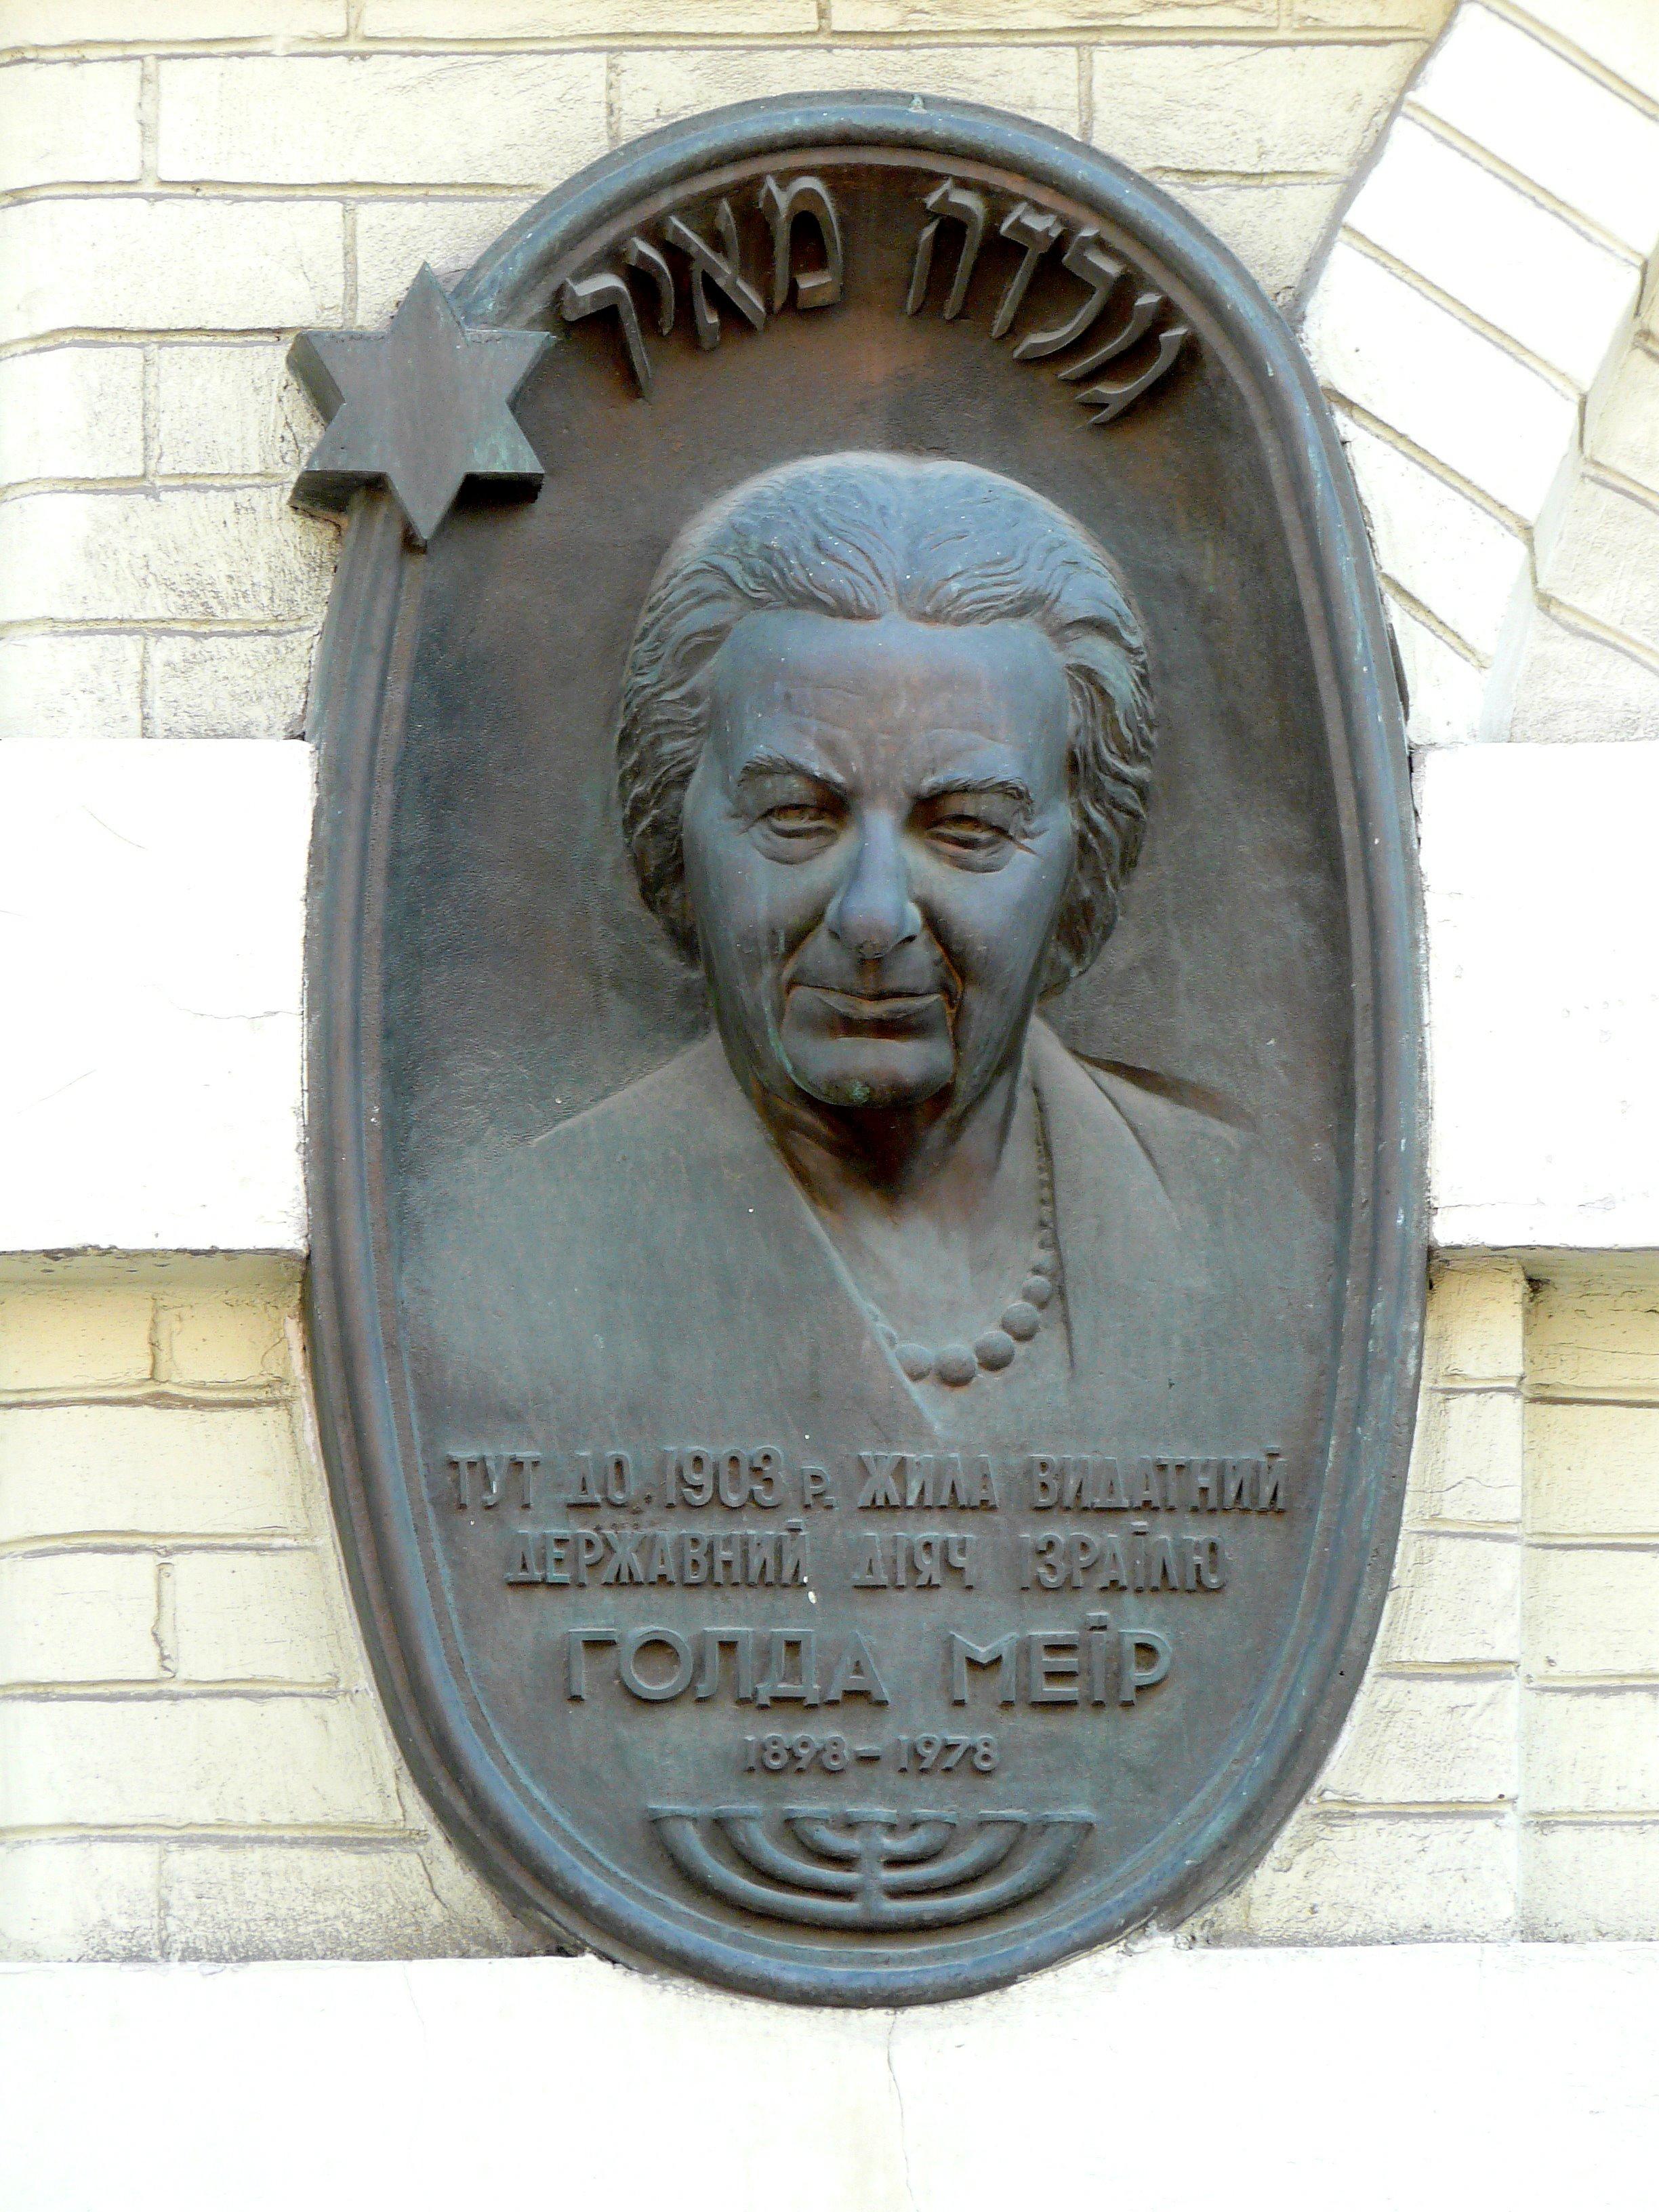 Photo of Golda Meir black plaque